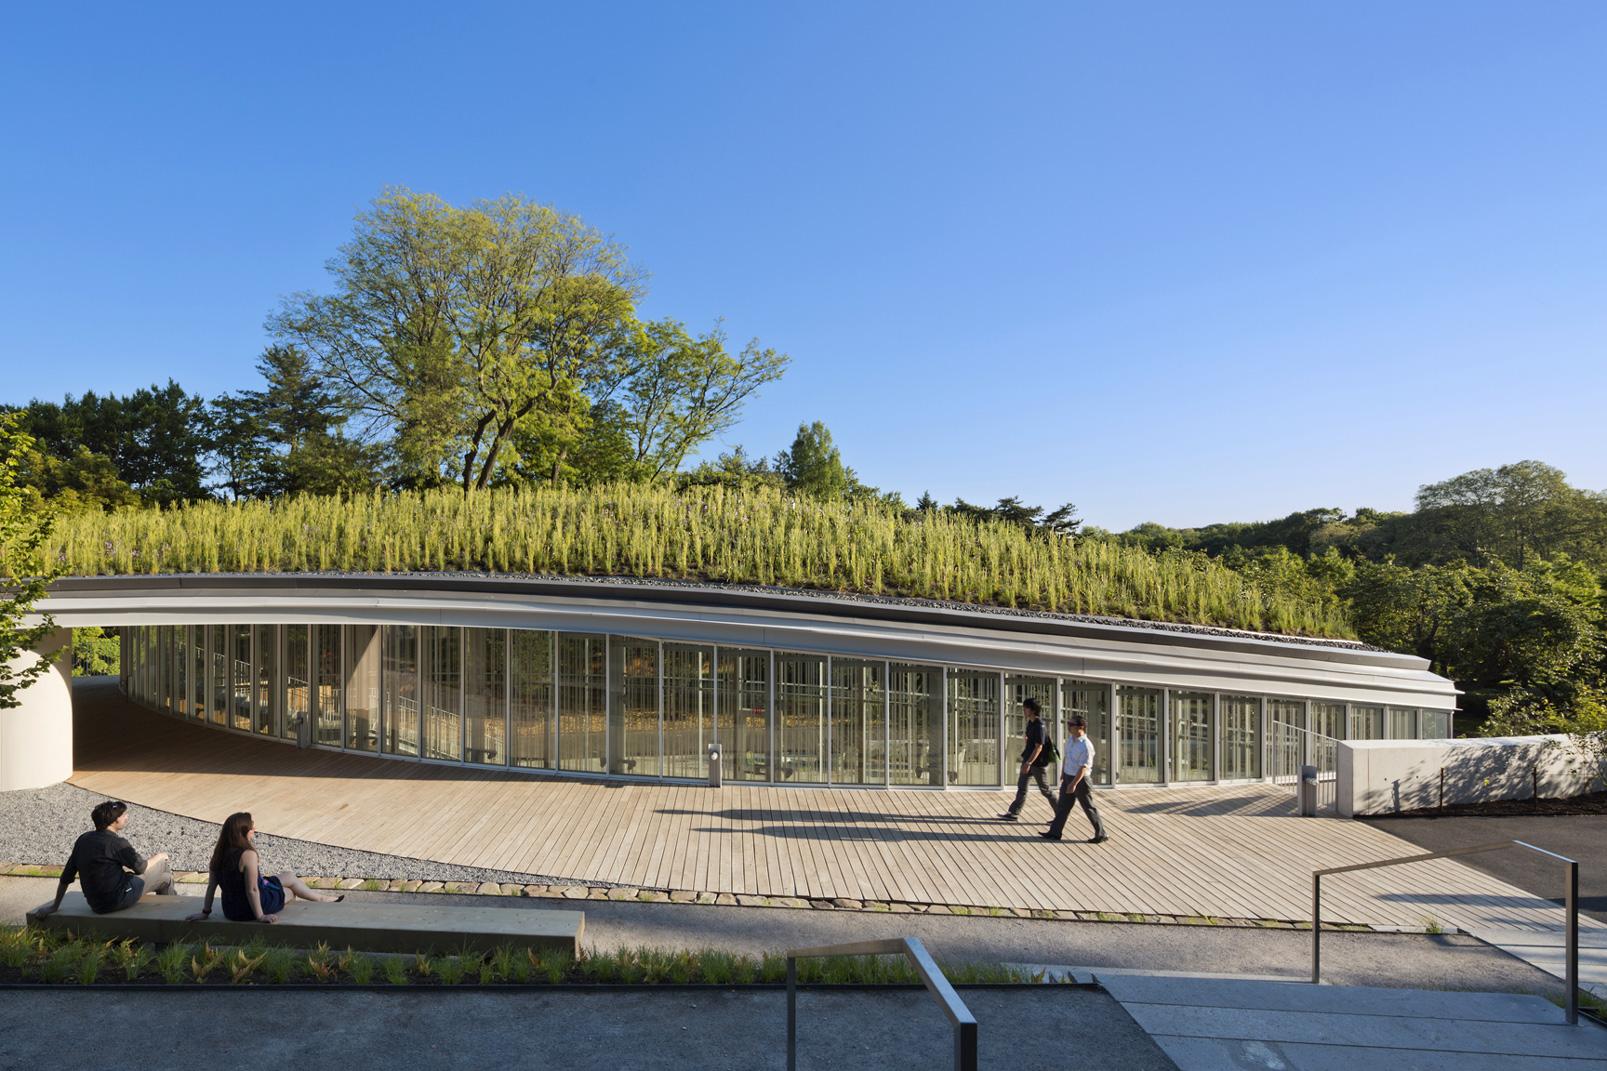 Weiss/Manfredi: Brooklyn Botanic Garden Visitor Center